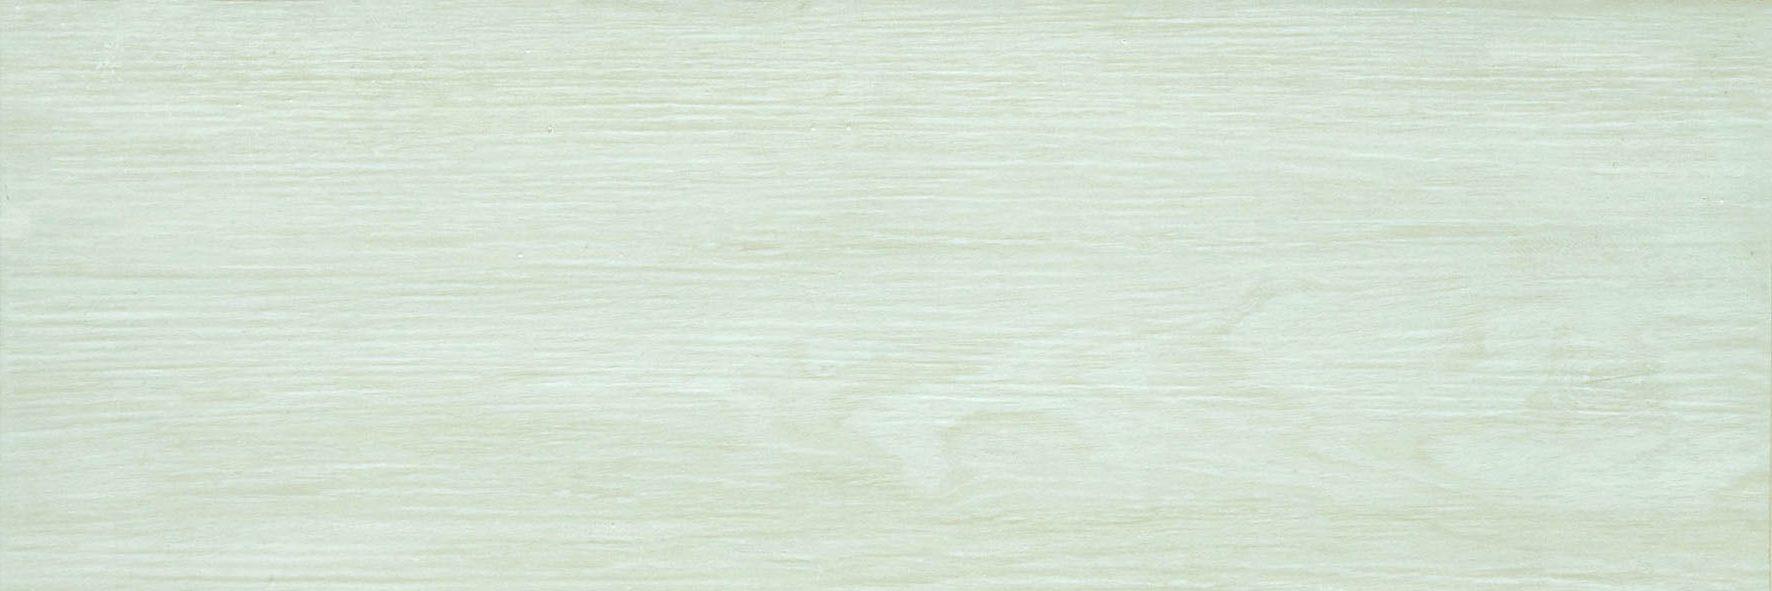 20x60,4 Elisir Bianco 2